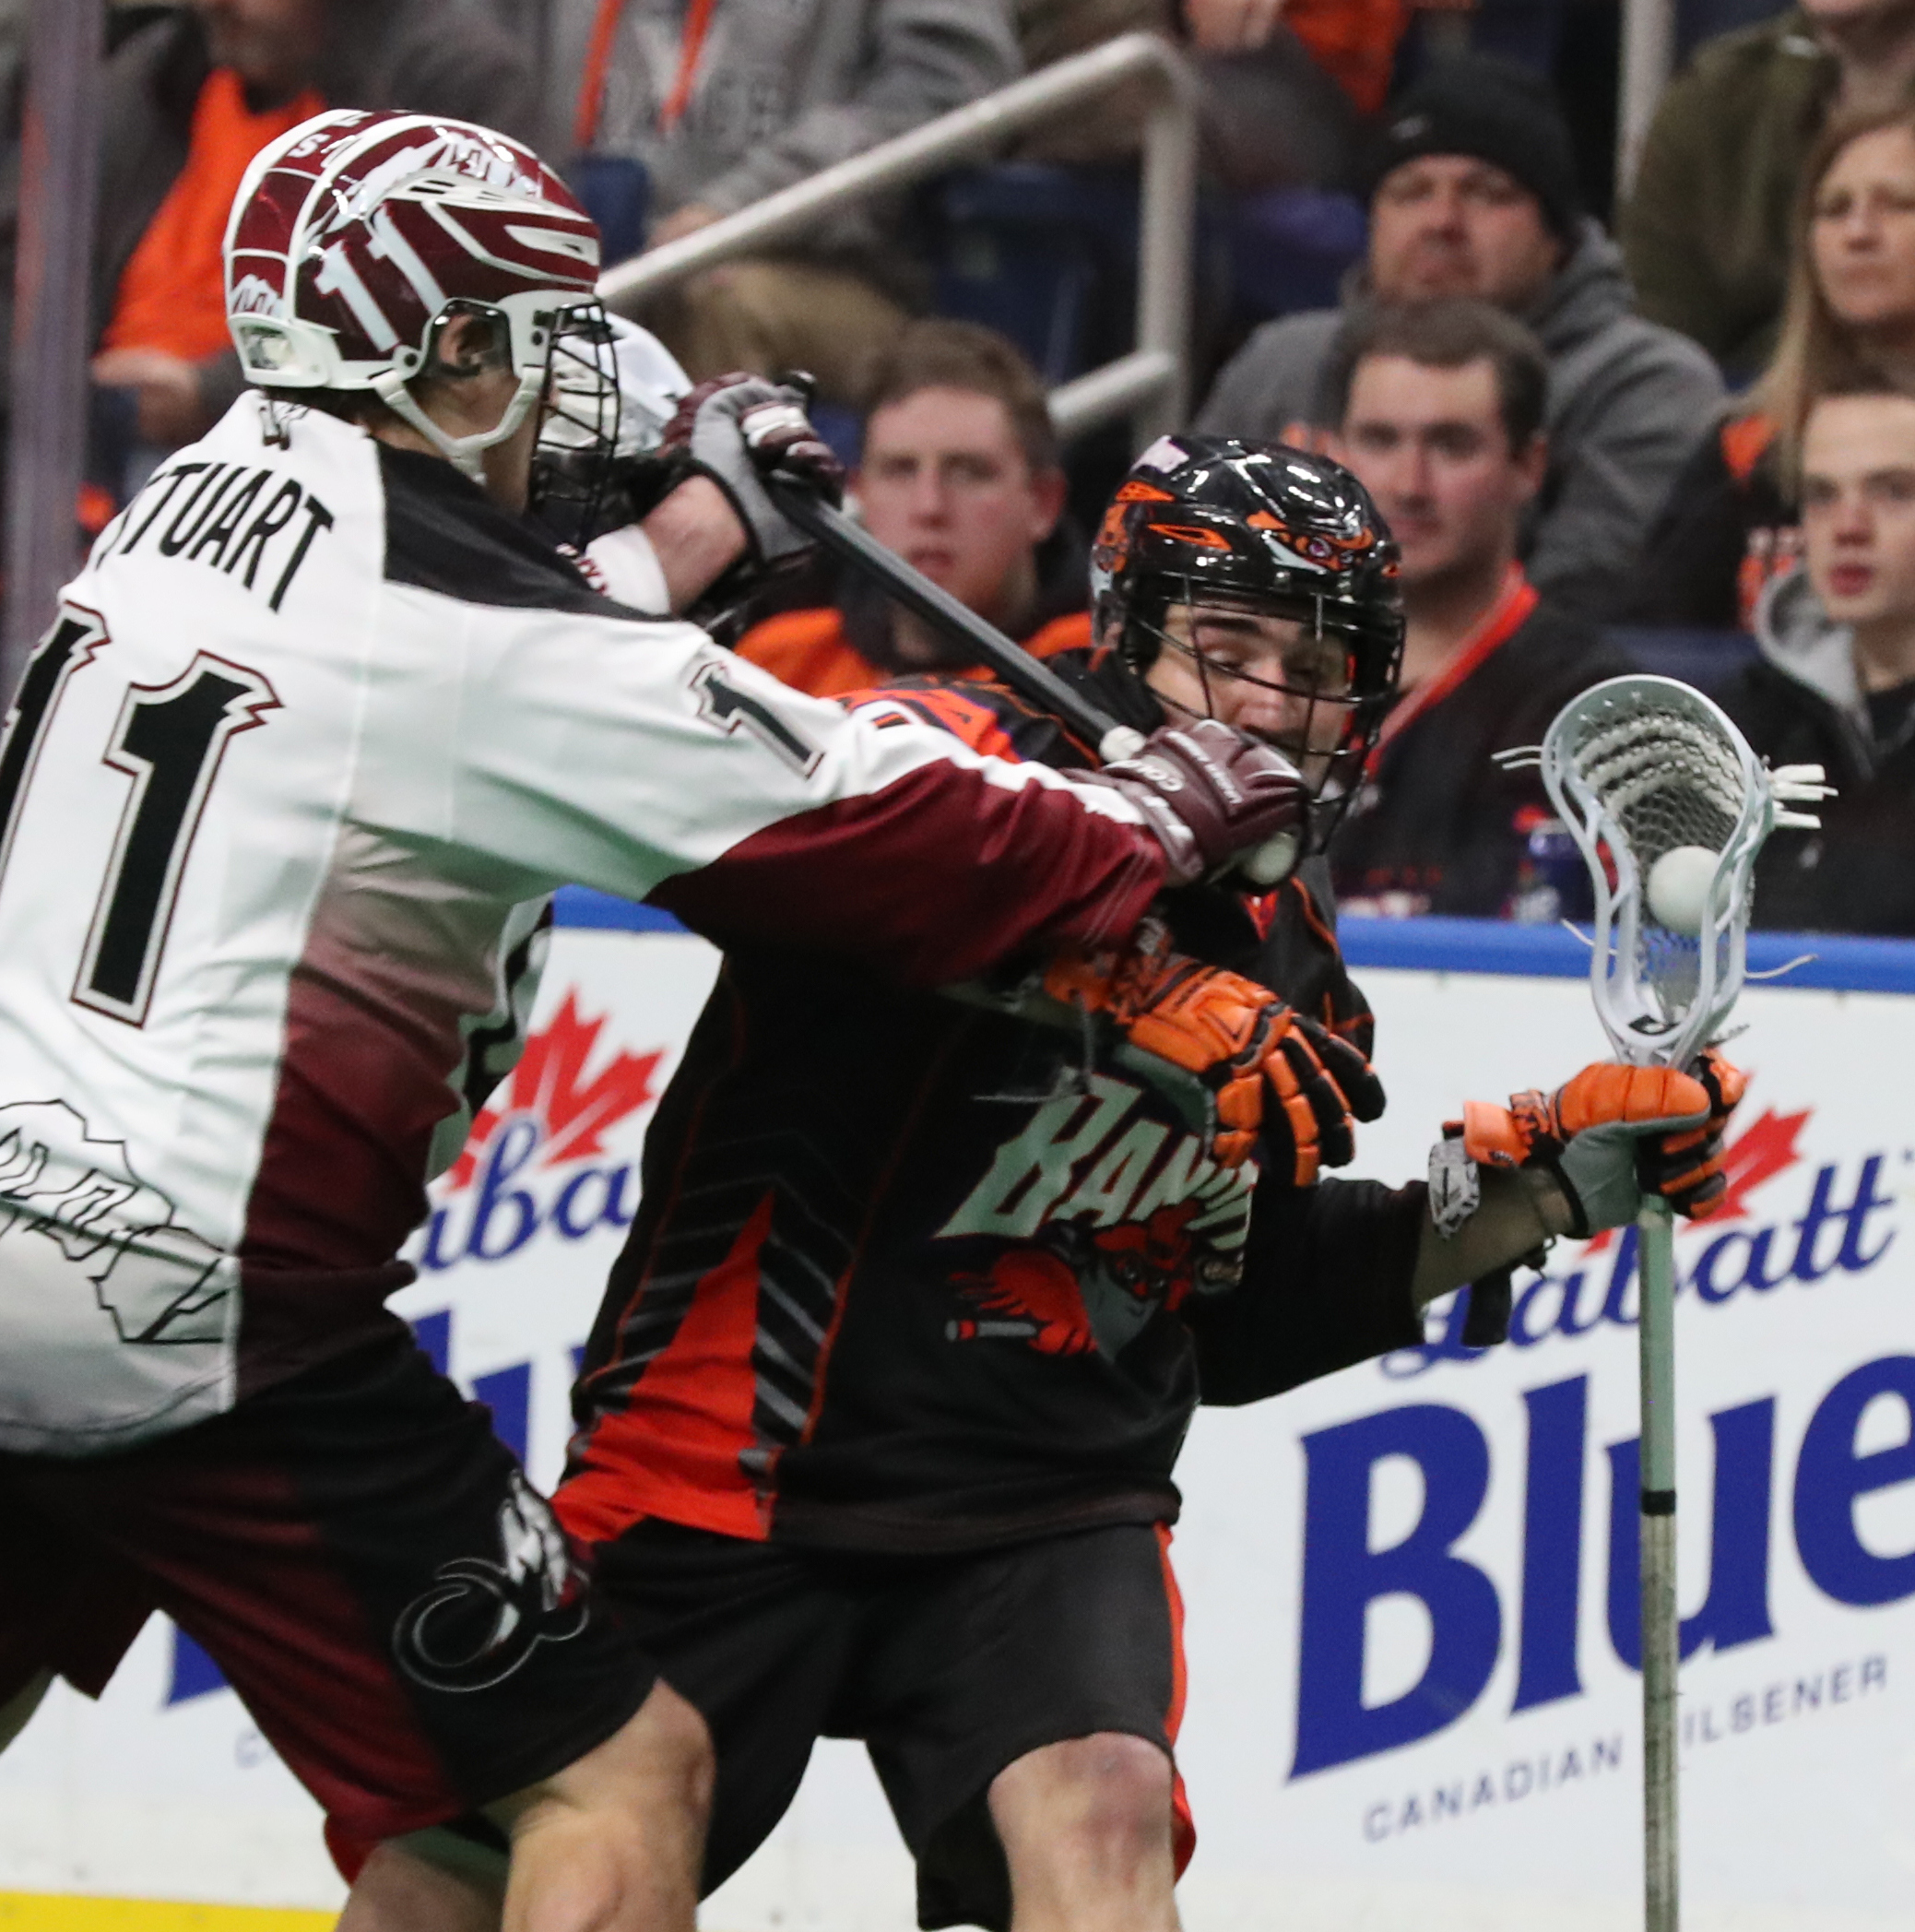 The Bandits' Andrew Watt battles the Mammoth's Taylor Stuart for the ball during Friday's opener.  (James P. McCoy/Buffalo News)